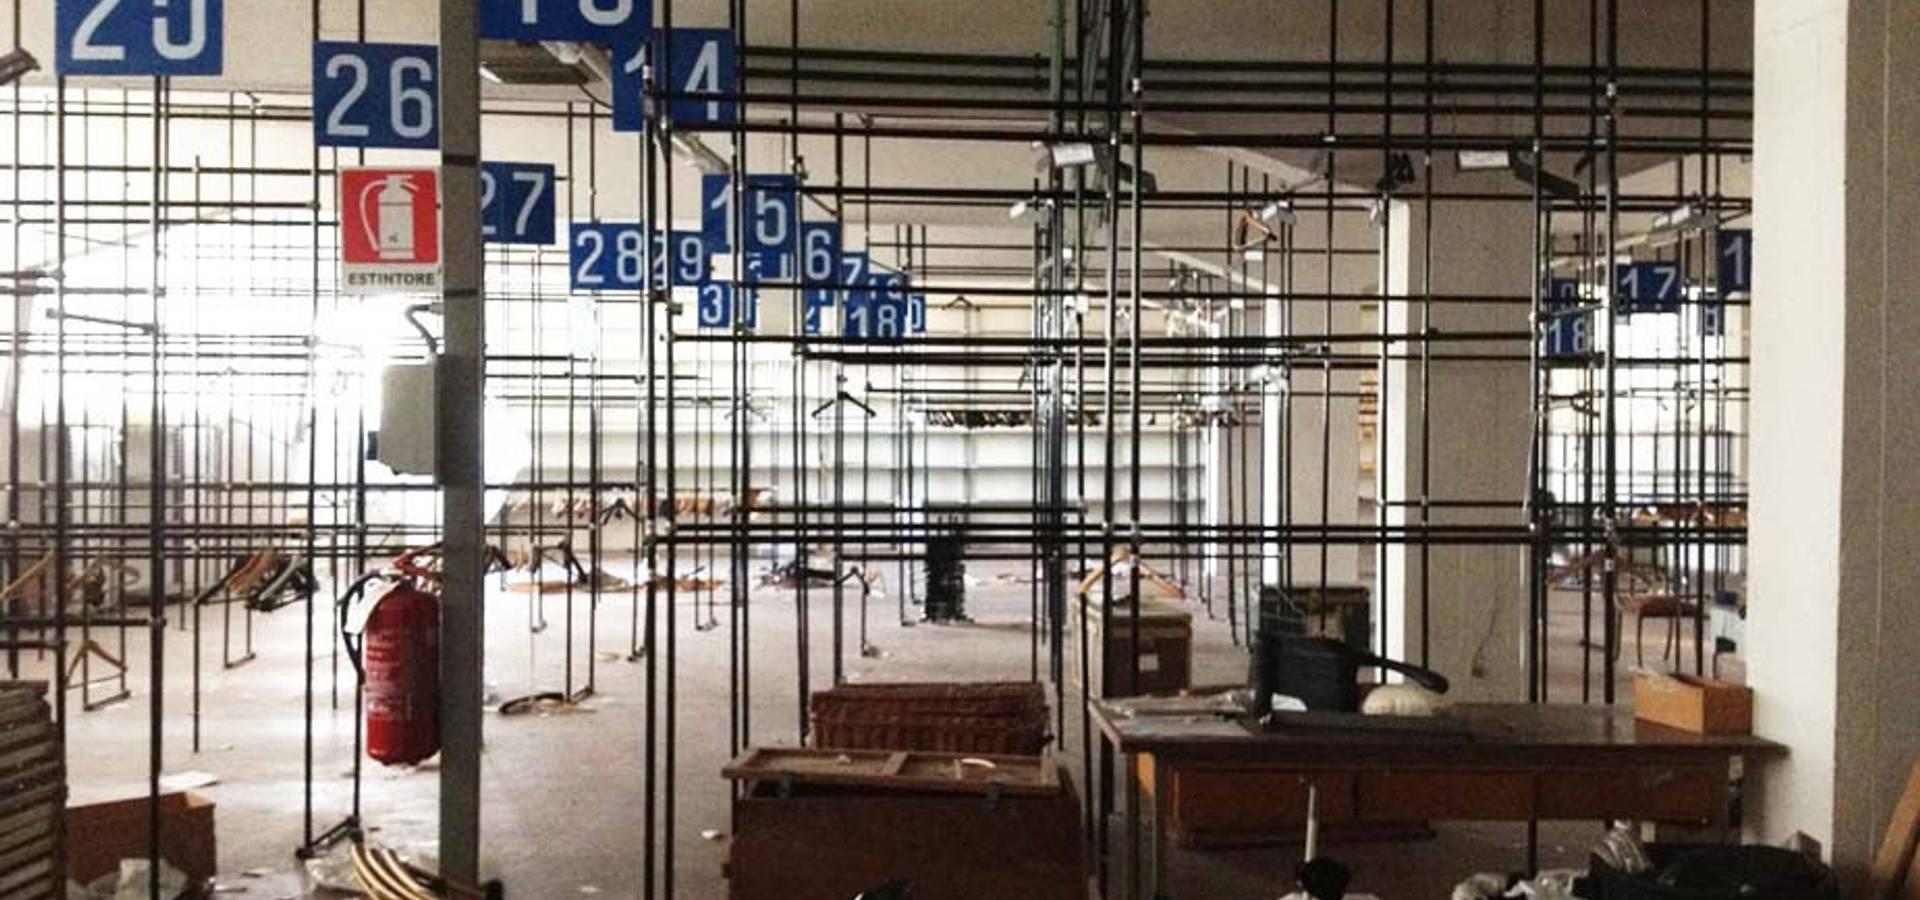 StudioKami Architecture & Engineering